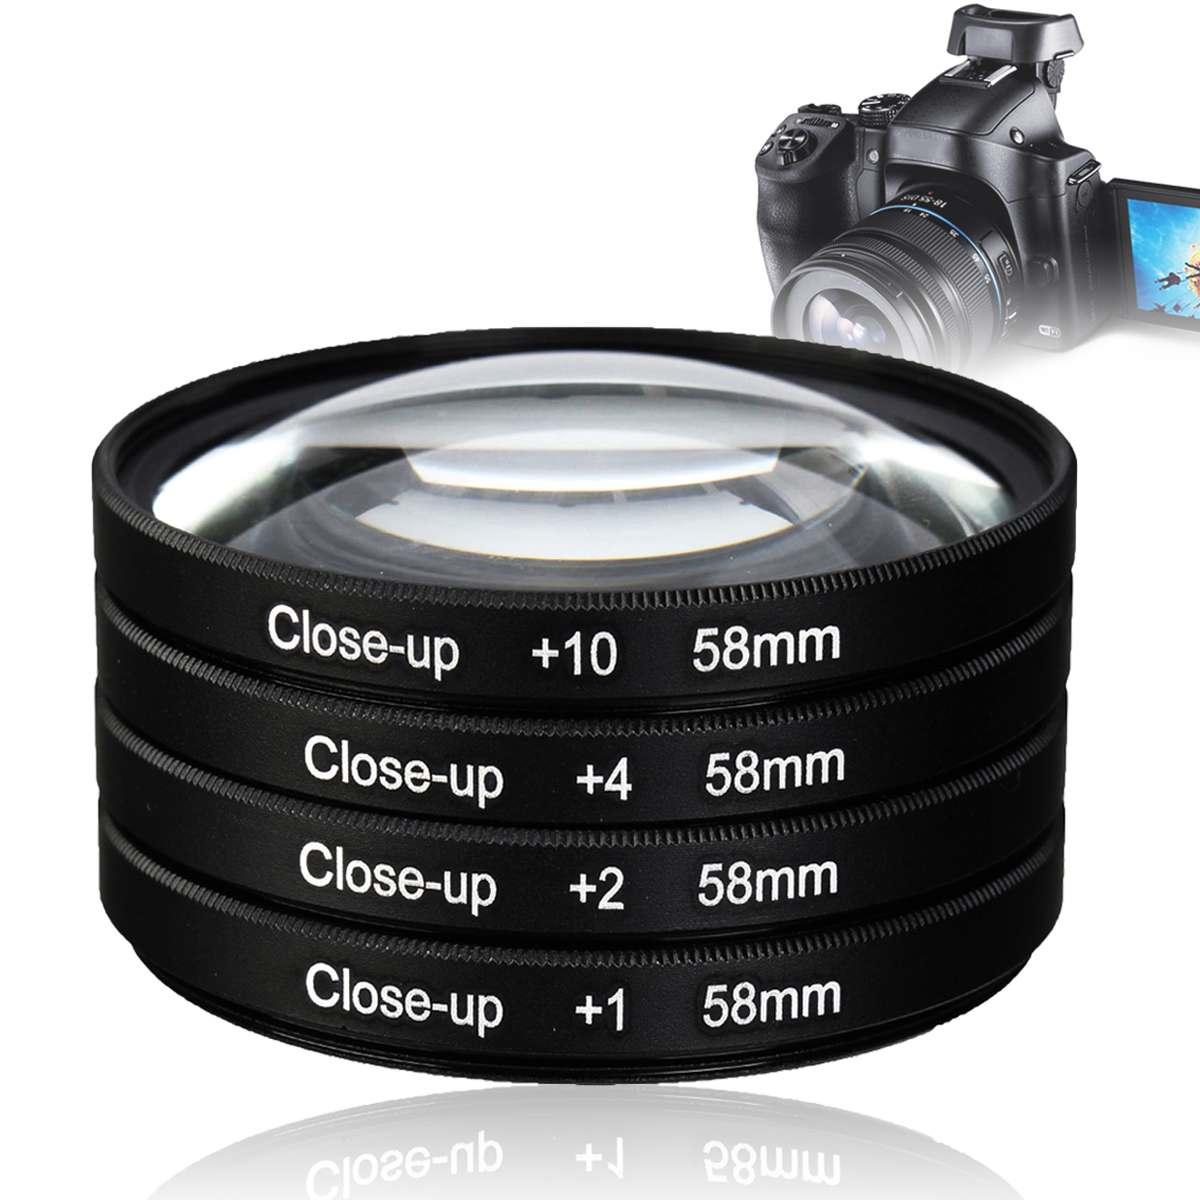 NEW 58mm Macro Close Up Lens filter +1+2+4+10 Filter Kit for canon for nikon for sony for pentax for DSLR Digital Camera